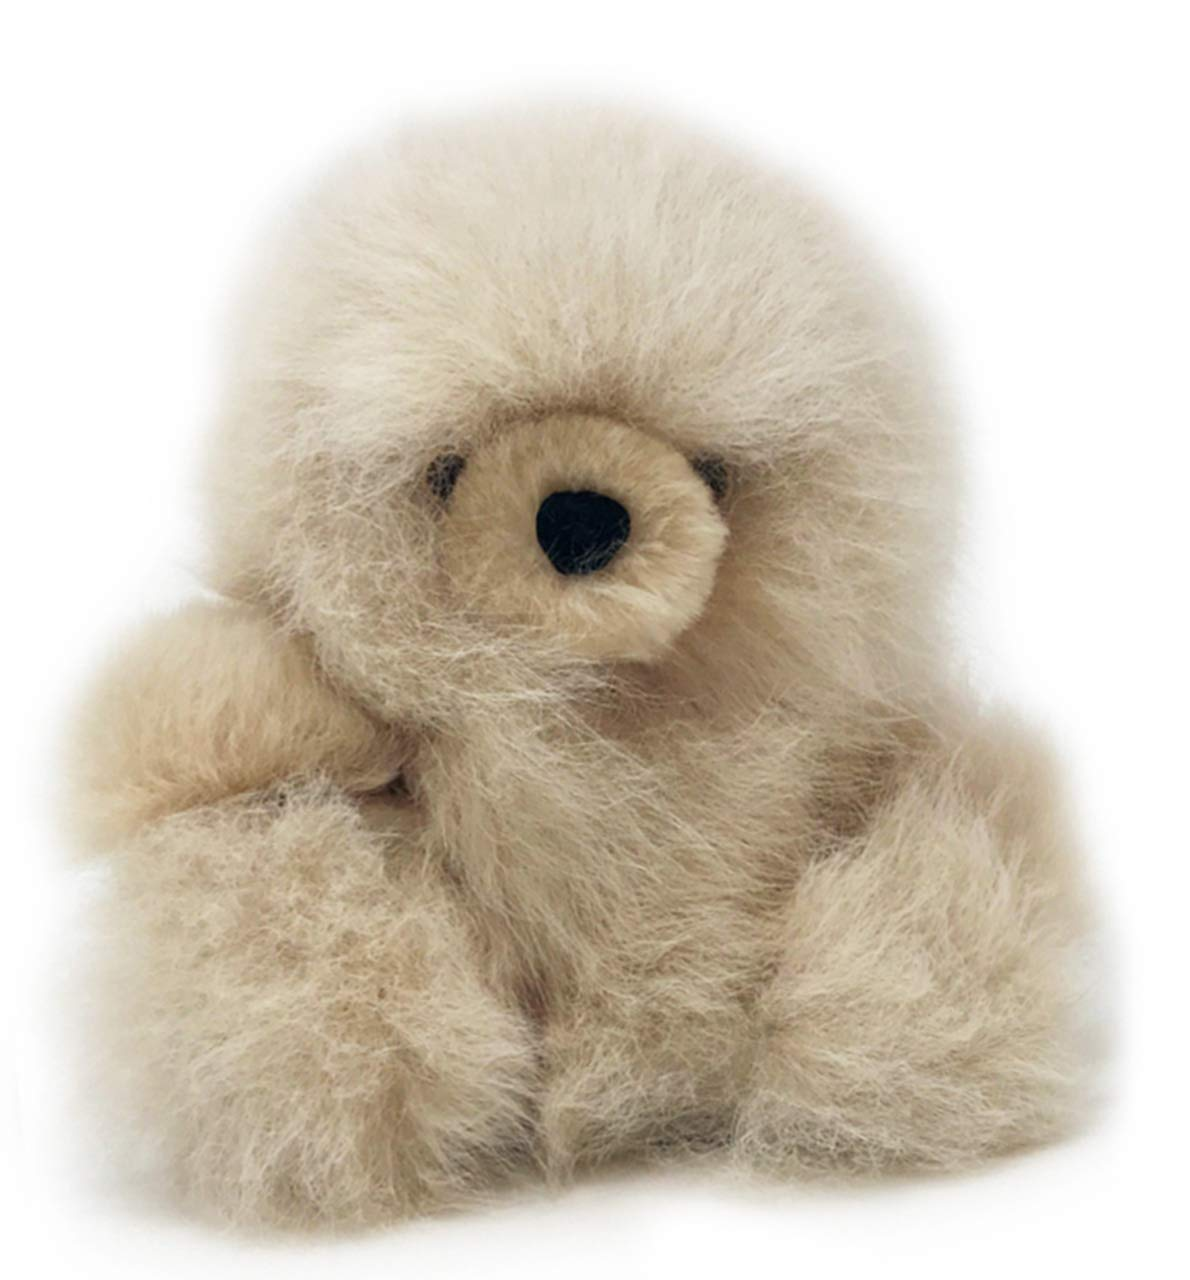 Baby Alpaca Fur Sitting Chubby Bear - Hand Made 5+ Inch Champagne - Each Bear is Unique by Inca Fashions